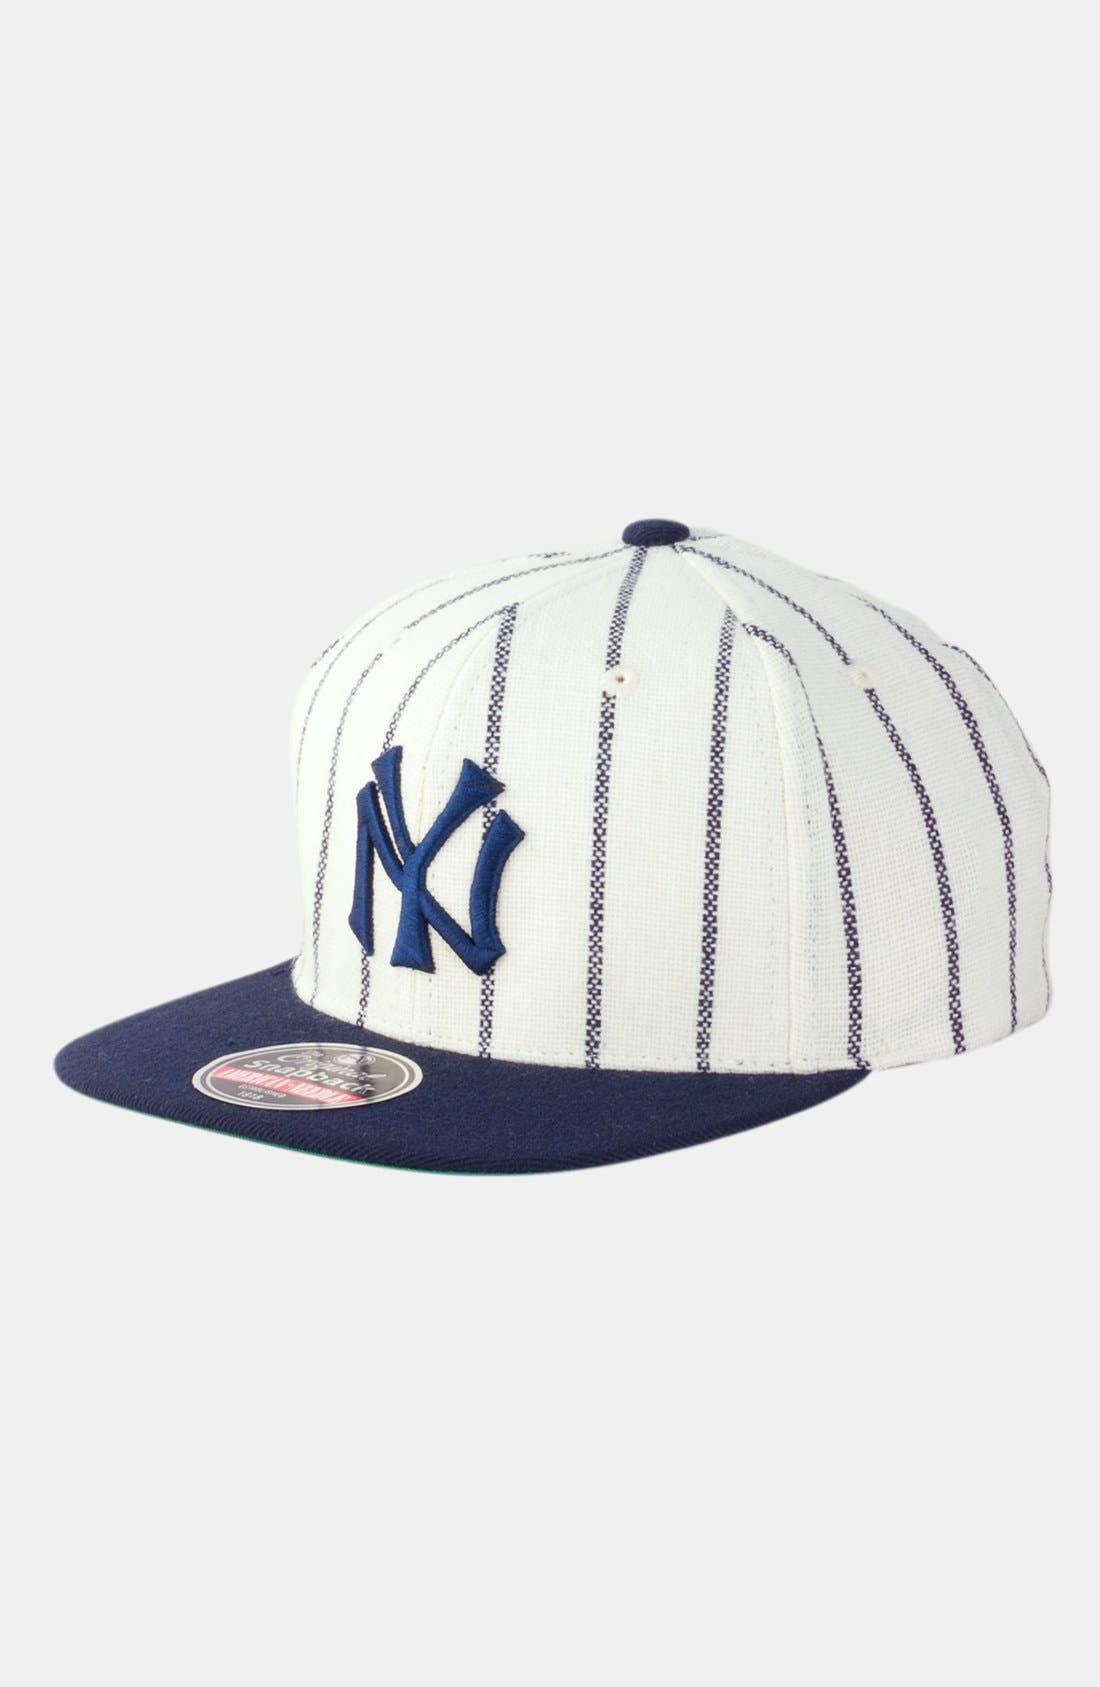 Main Image - American Needle 'New York Yankees 1921 - 400 Series' Snapback Baseball Cap